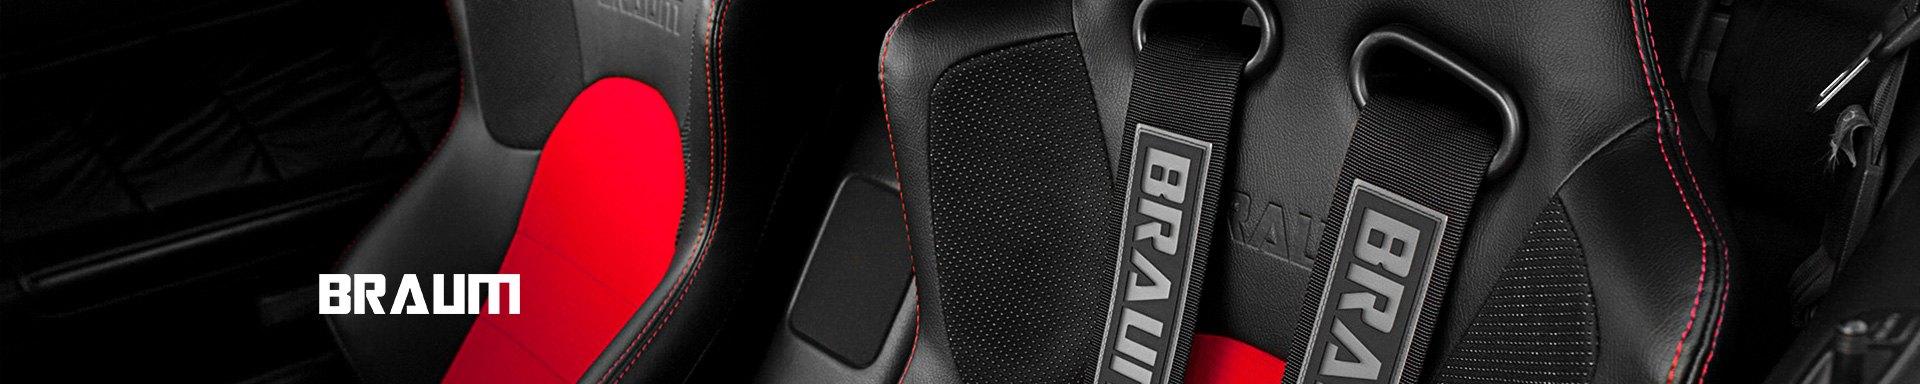 BRAUM™ | Racing Seats & Harness Pads — CARiD com